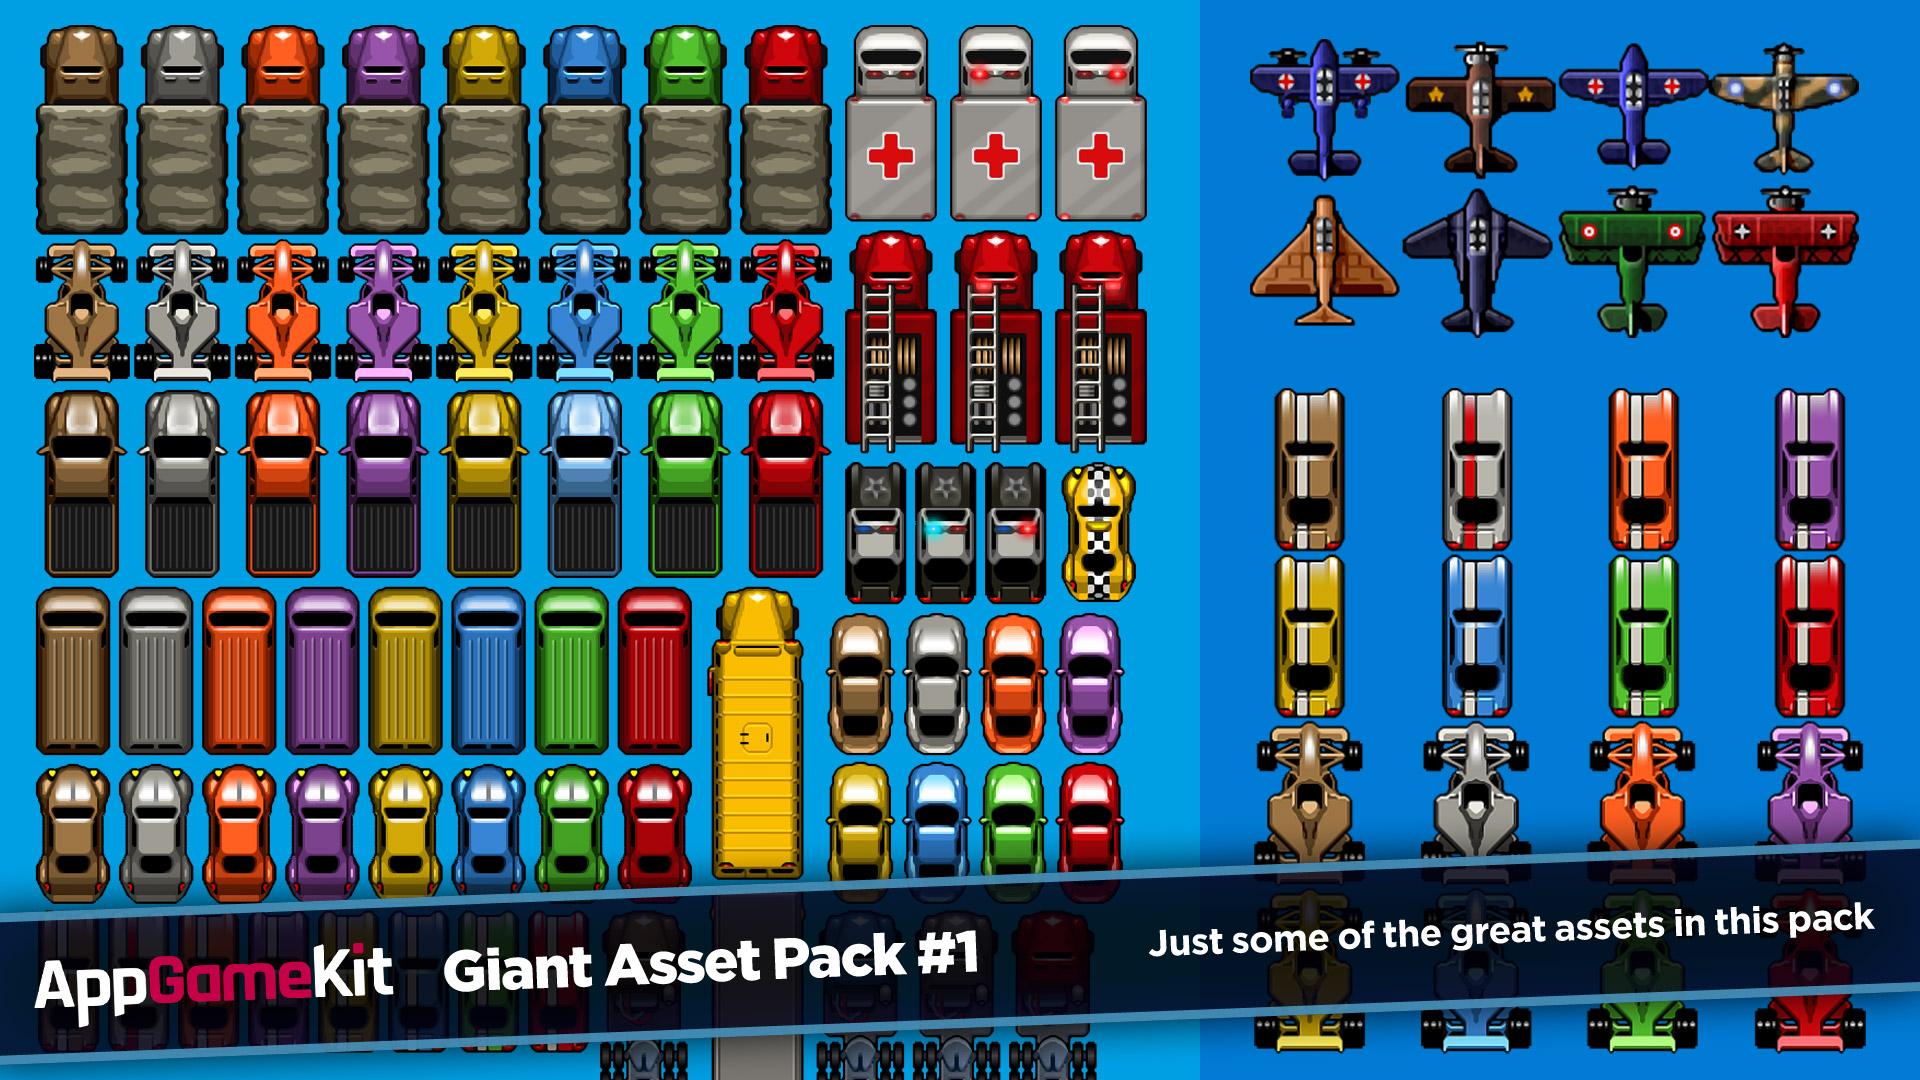 AppGameKit - AppGameKit Giant Asset Pack 1